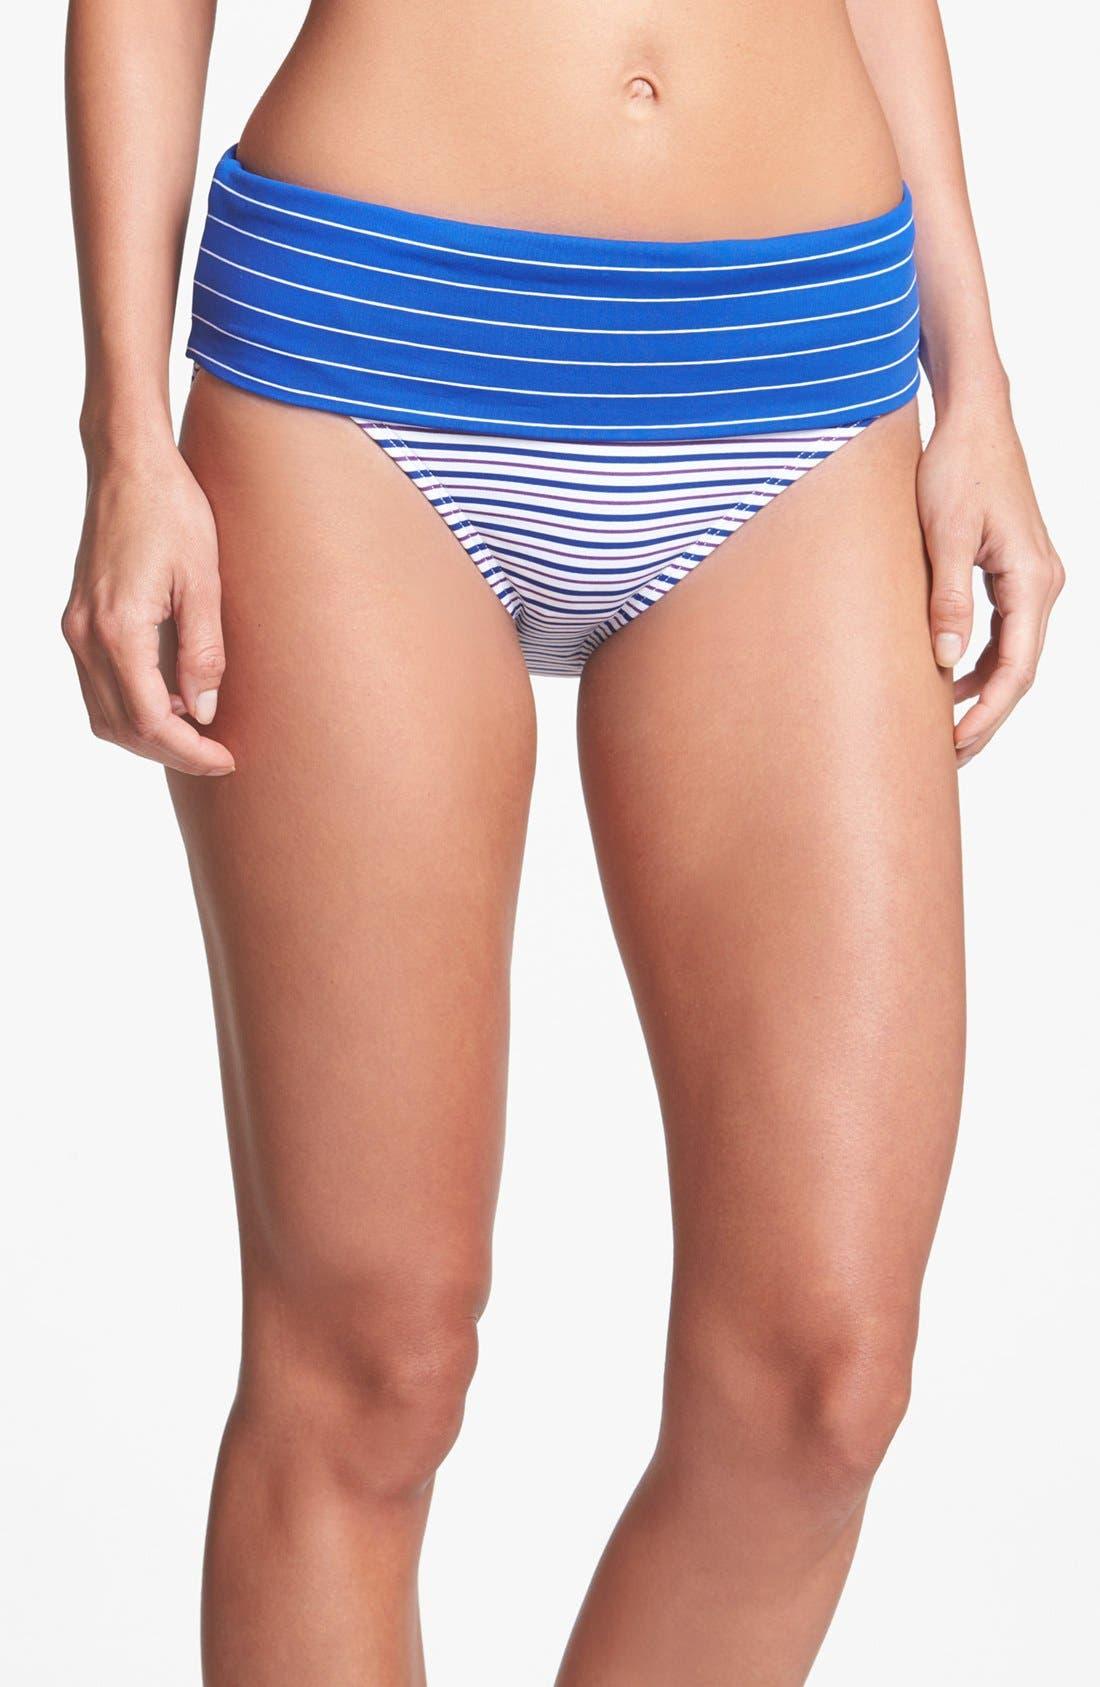 Main Image - Tommy Bahama 'Mingling' High Waist Bikini Bottoms